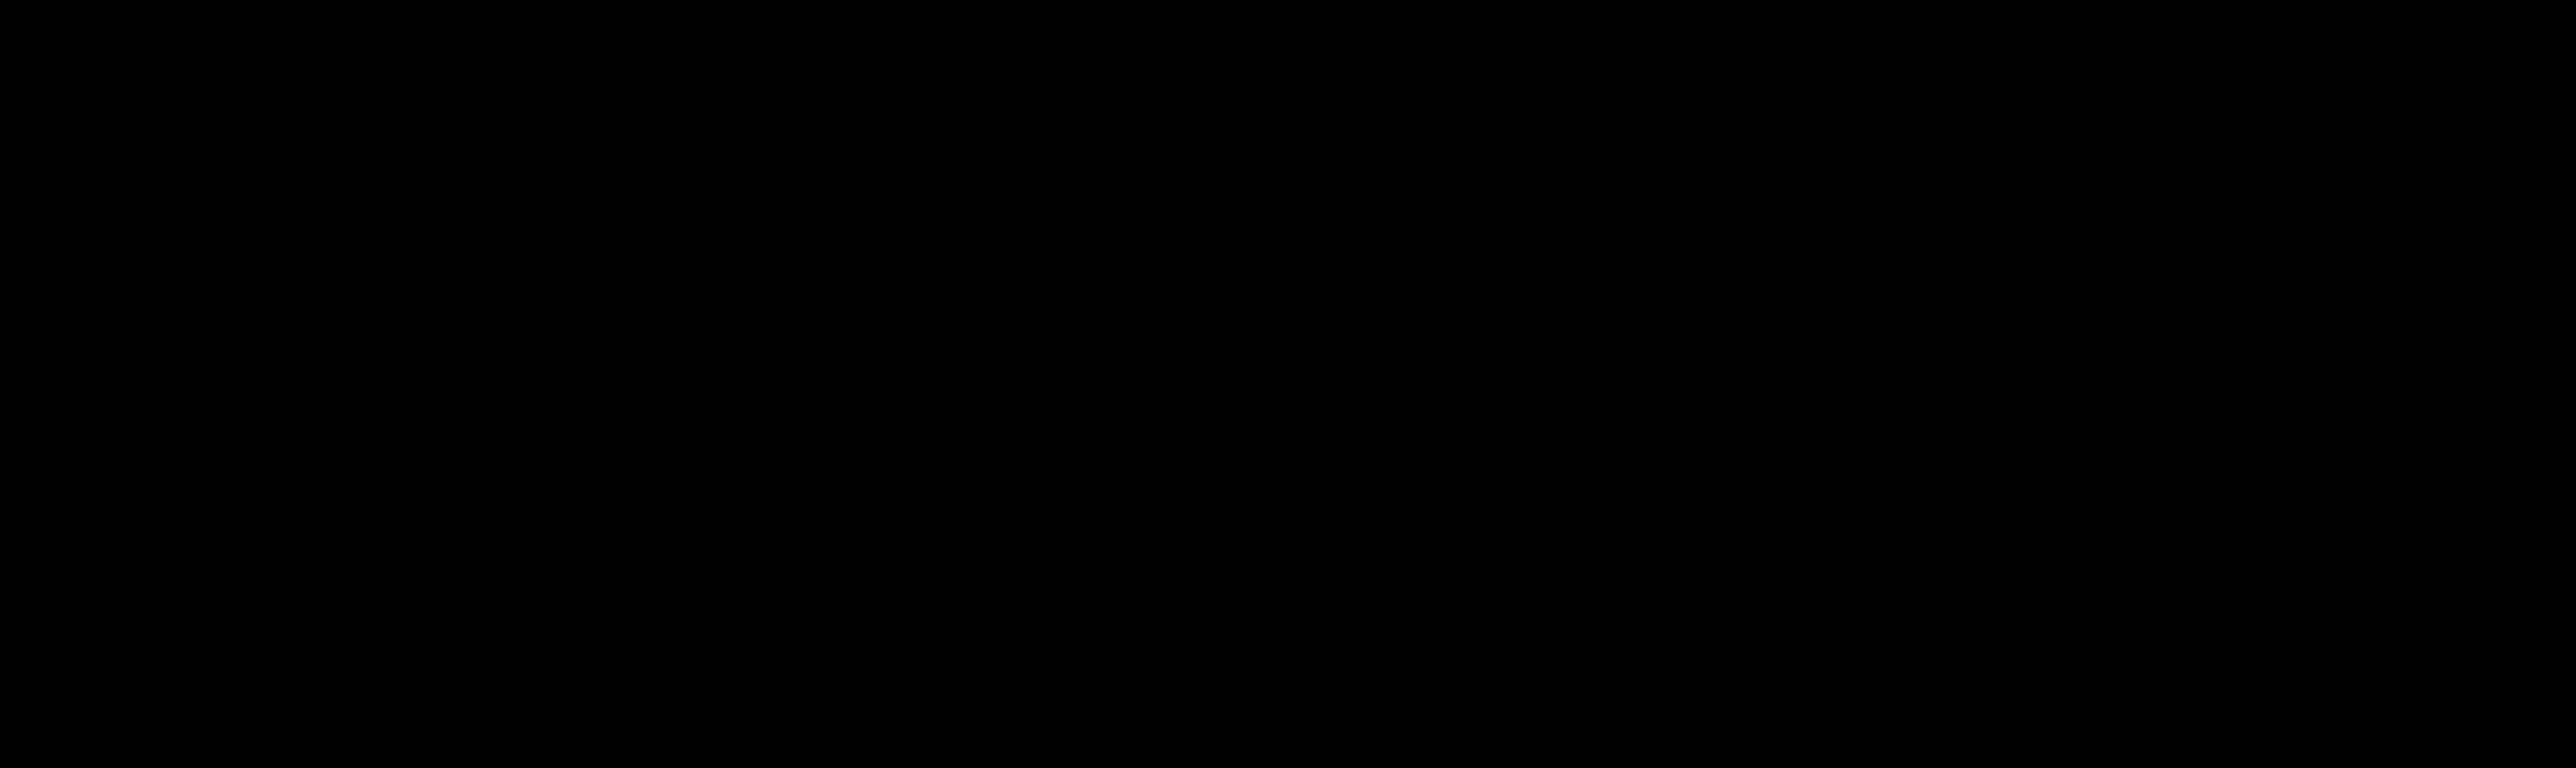 Variant – Commercial Trailer – 3021 P4 (555x210x93 cm)